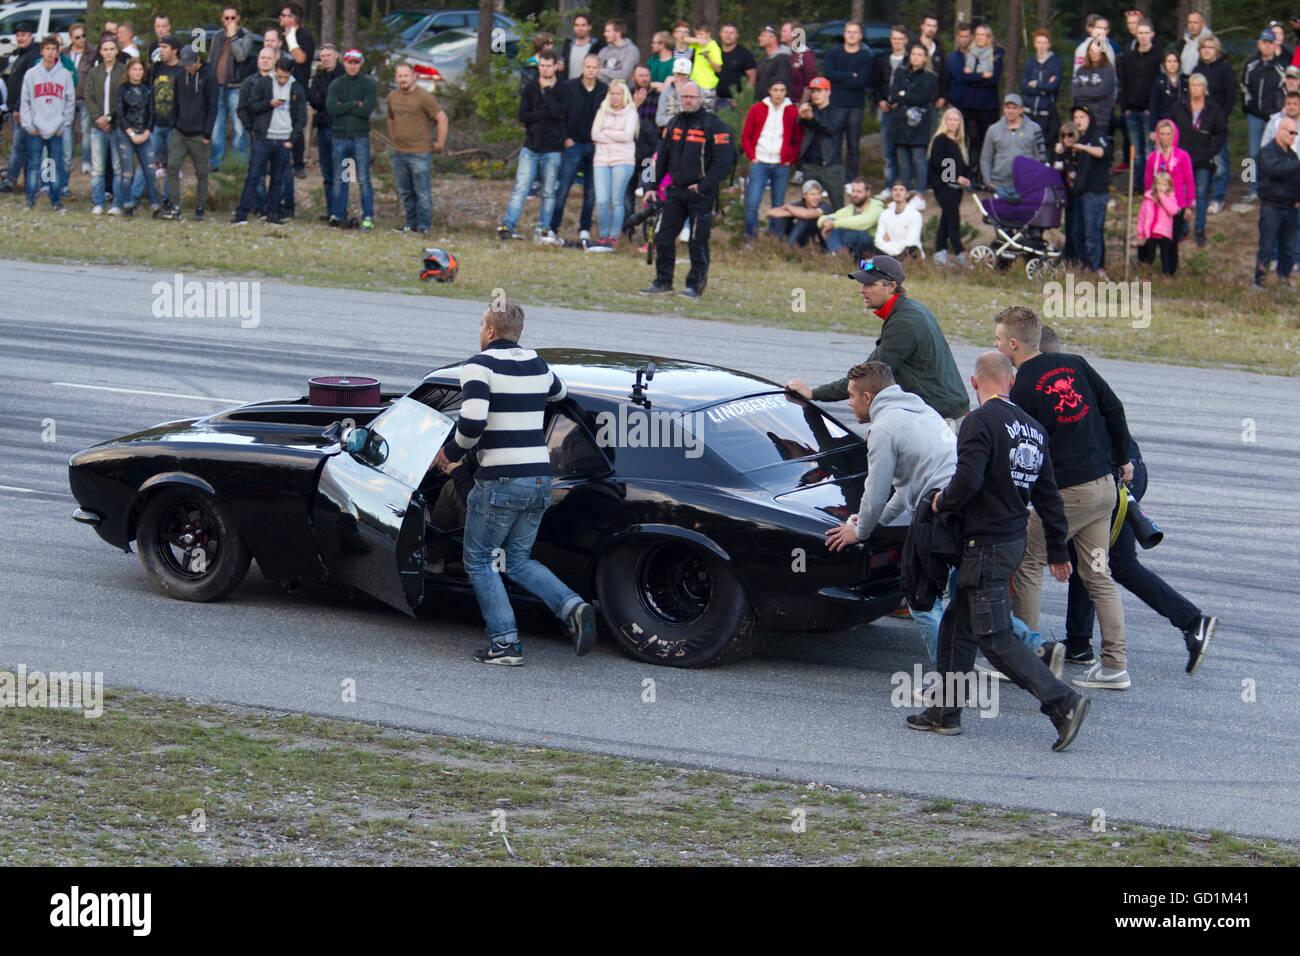 Cars In An Illegal Street Race Sweden